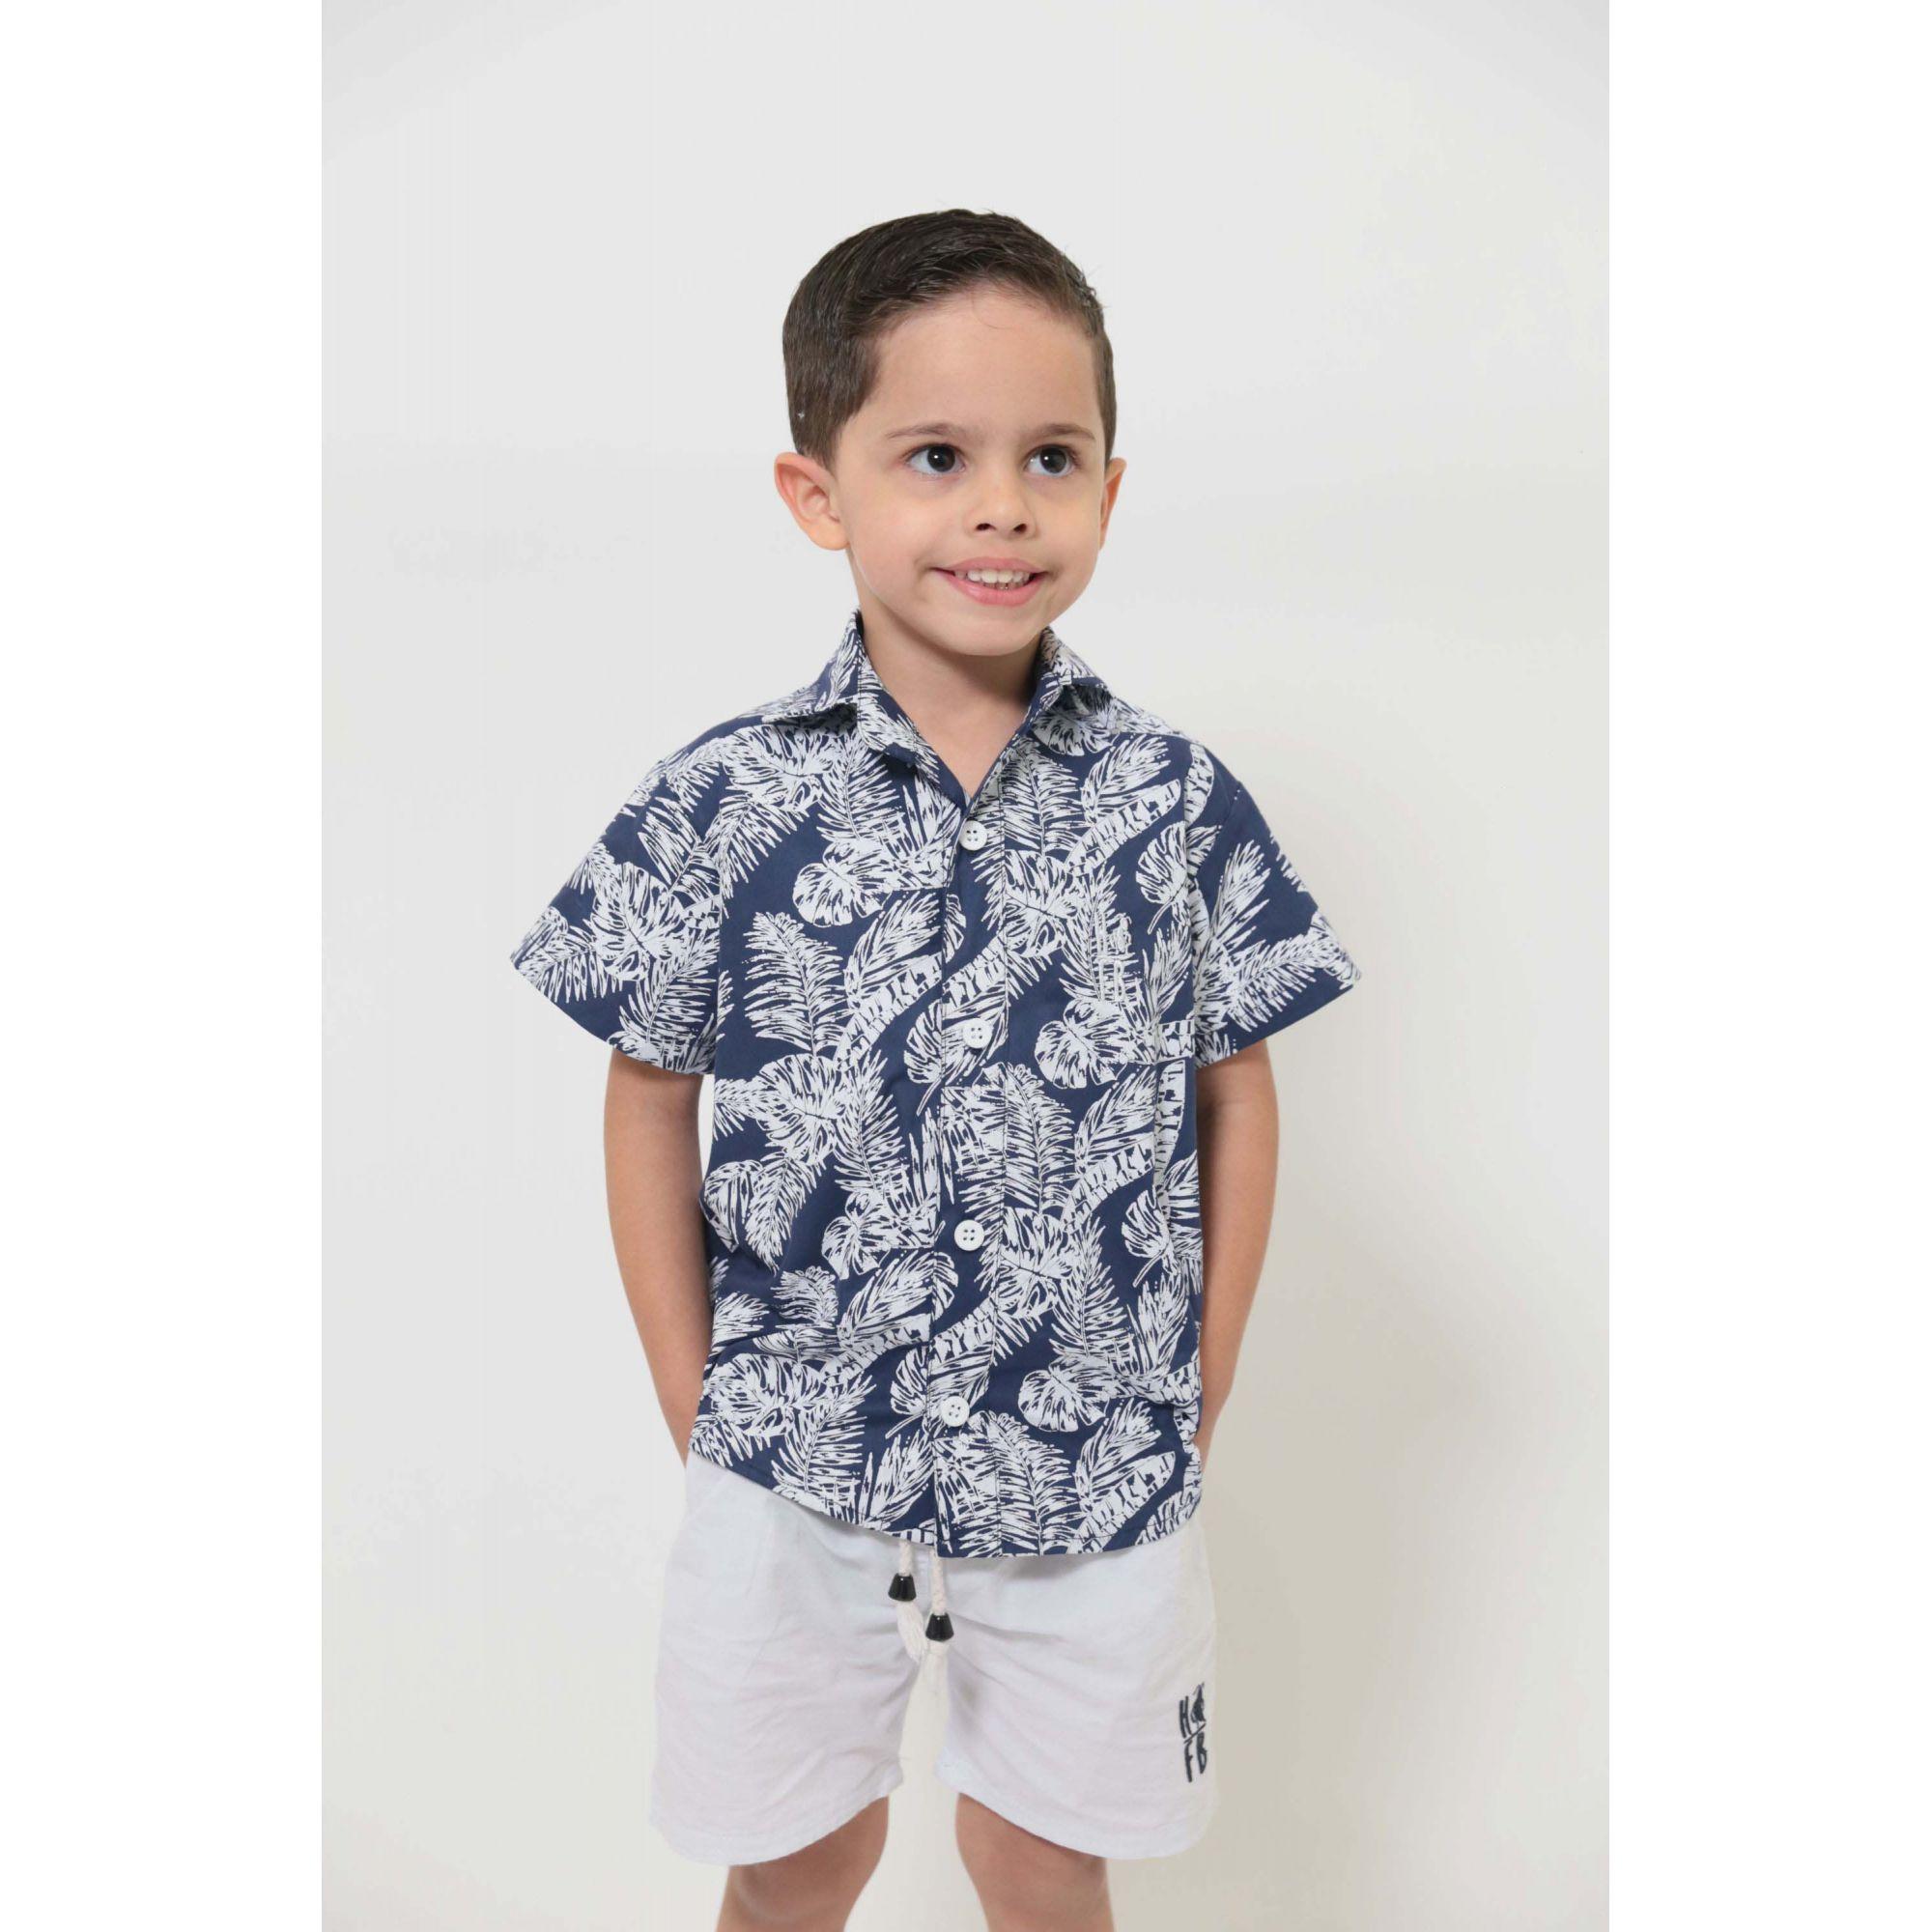 Camisa Social Manga Curta Azul Floresta Infantil  - Heitor Fashion Brazil